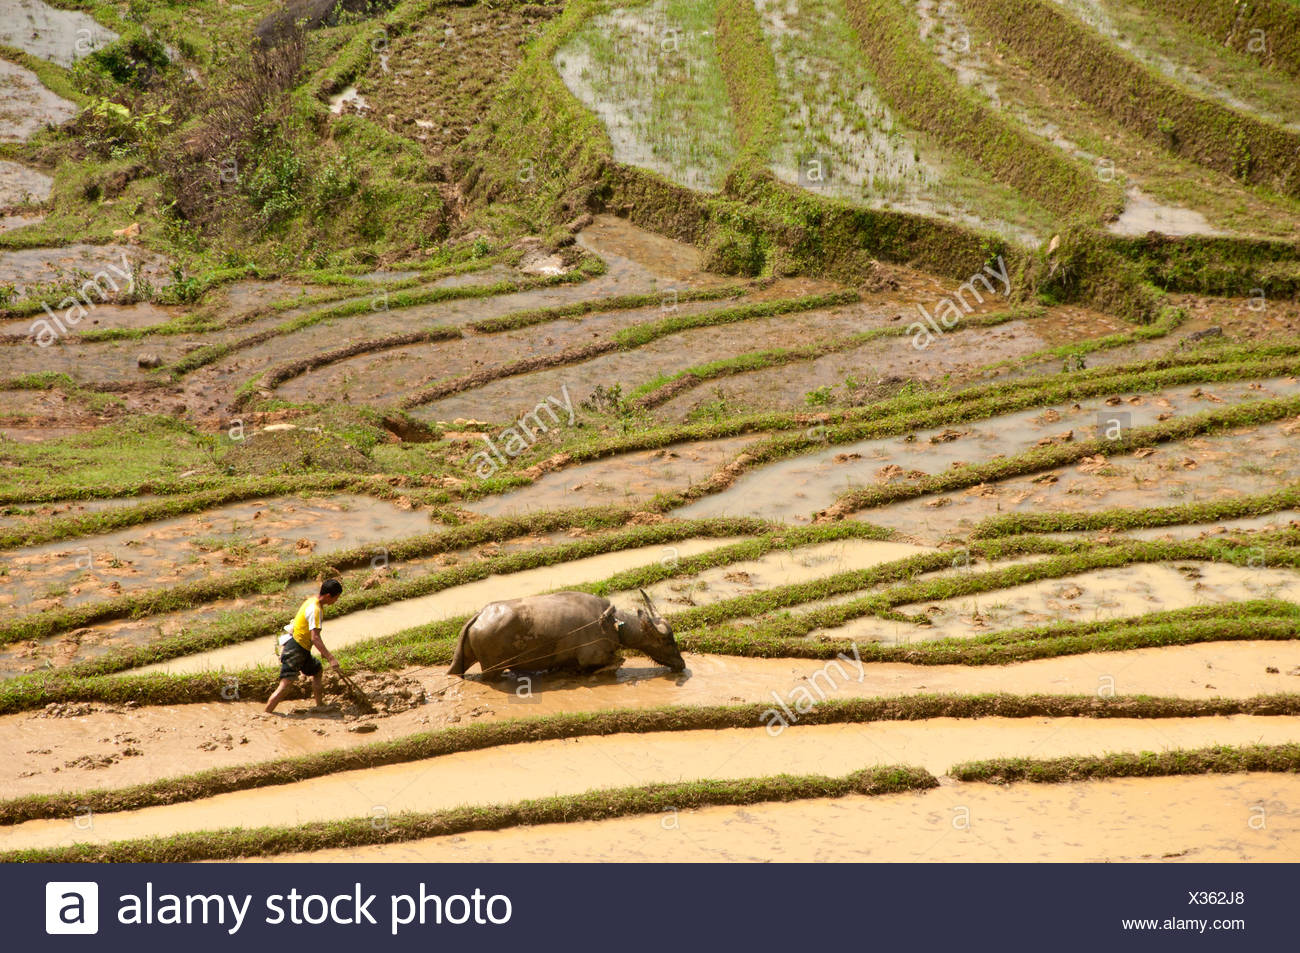 Rice field, terracing, Sapa, Northern Vietnam, Vietnam, Asia, rice, agriculture, farmer, rice, plants, farming, cattle - Stock Image